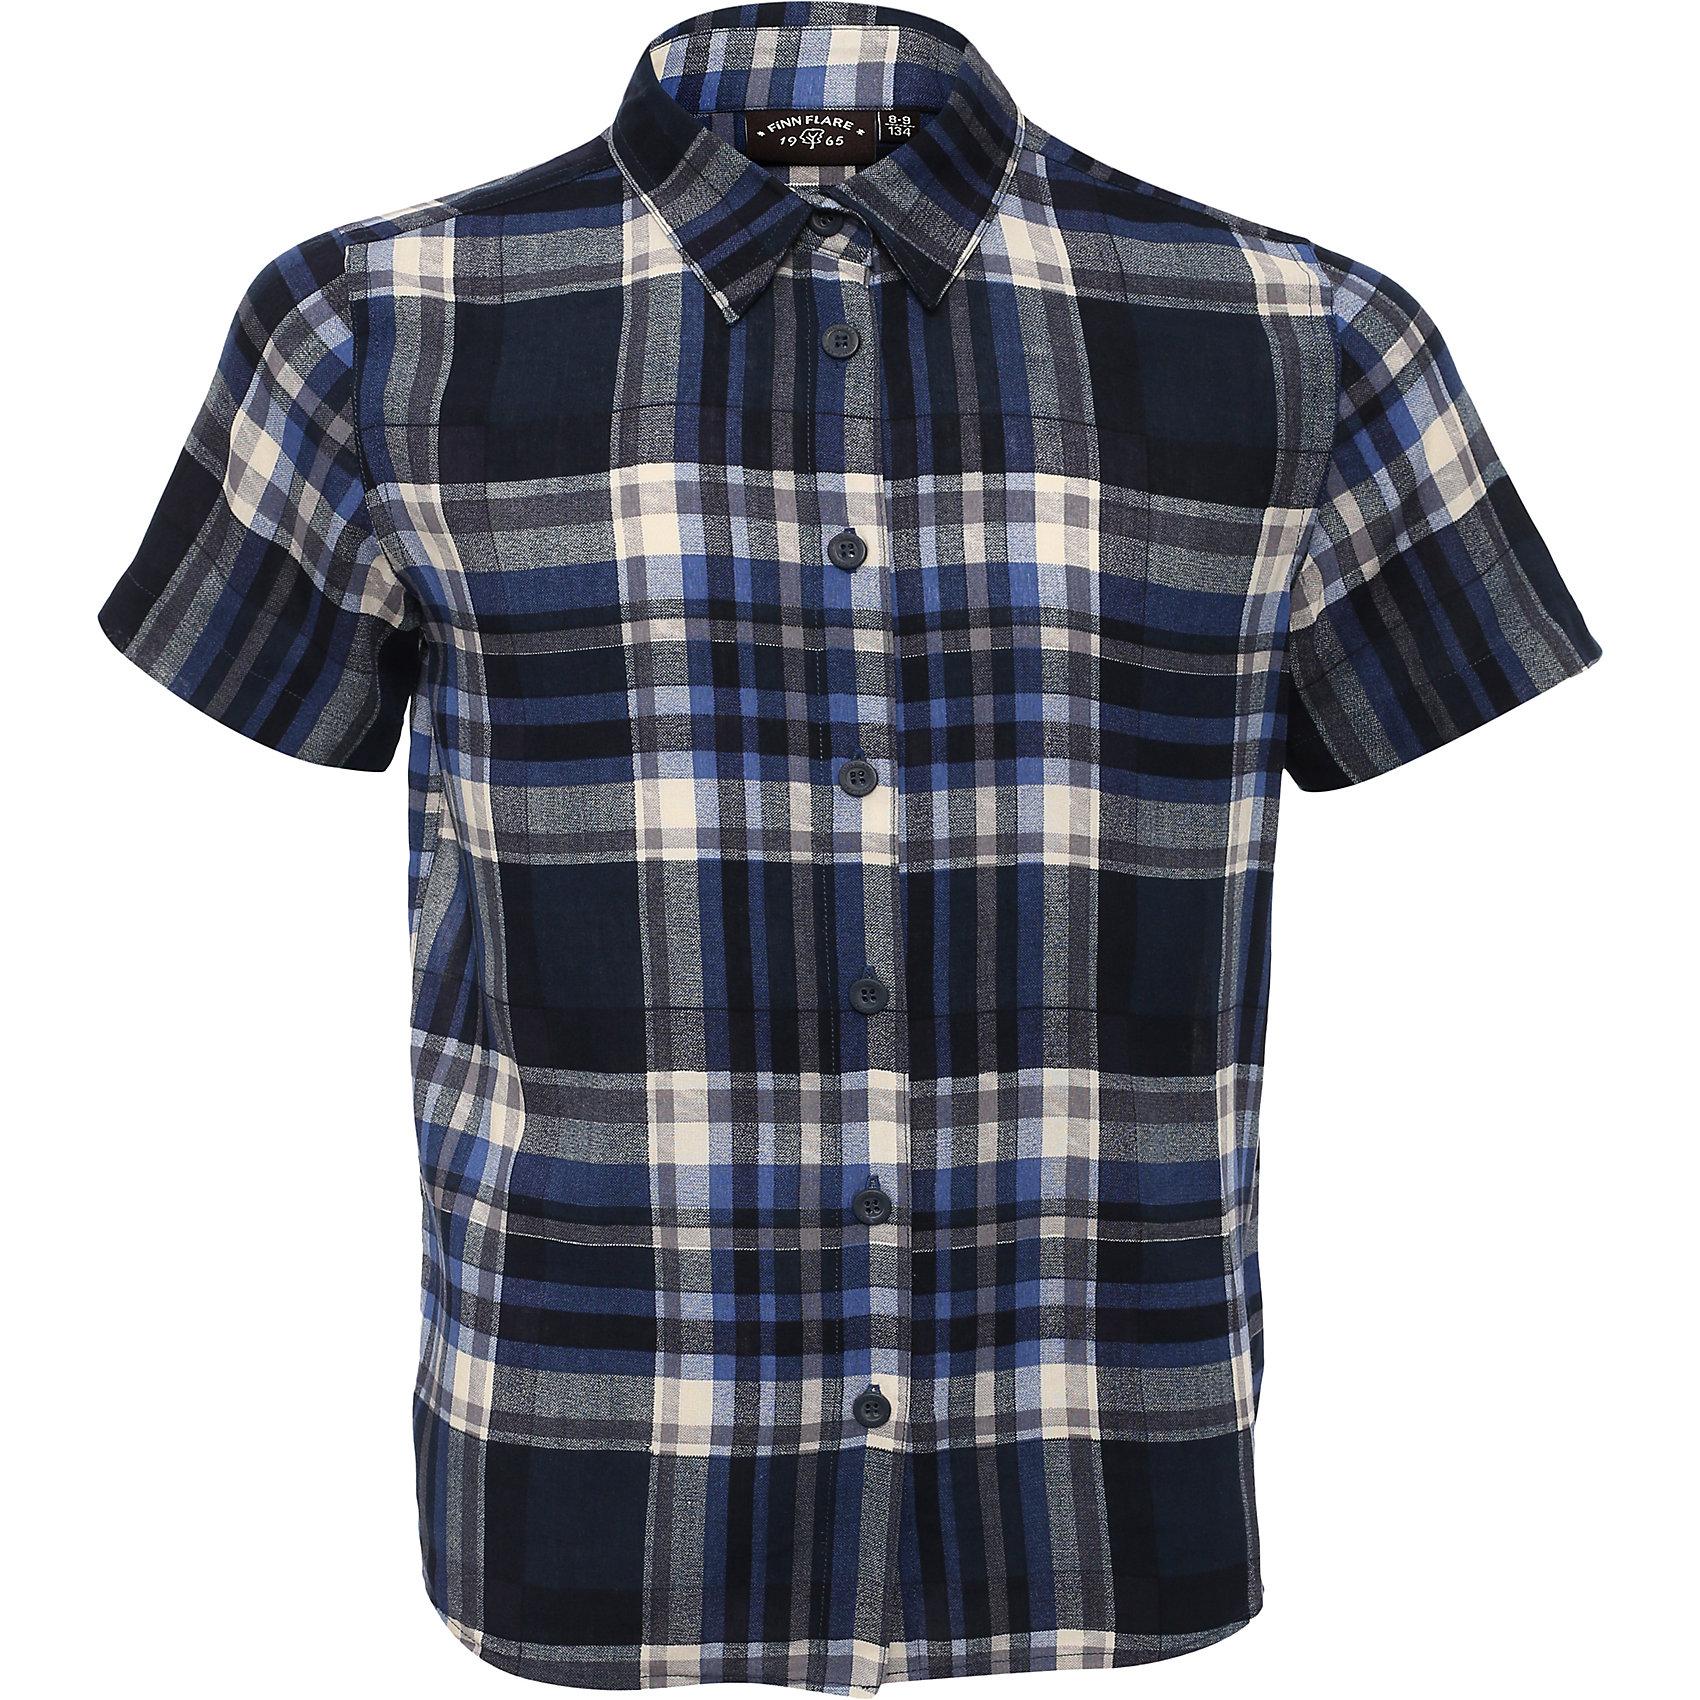 Рубашка для мальчика Finn FlareБлузки и рубашки<br>Рубашка для мальчика от известного бренда Finn Flare<br>Фактура материала:Текстильный<br>Вид застежки:Пуговицы<br> Длина рукава:Короткие<br> Тип карманов:Без карманов<br>Состав:<br>100% вискоза<br><br>Ширина мм: 174<br>Глубина мм: 10<br>Высота мм: 169<br>Вес г: 157<br>Цвет: темно-синий<br>Возраст от месяцев: 72<br>Возраст до месяцев: 84<br>Пол: Мужской<br>Возраст: Детский<br>Размер: 122,110,134,146,158<br>SKU: 4835660